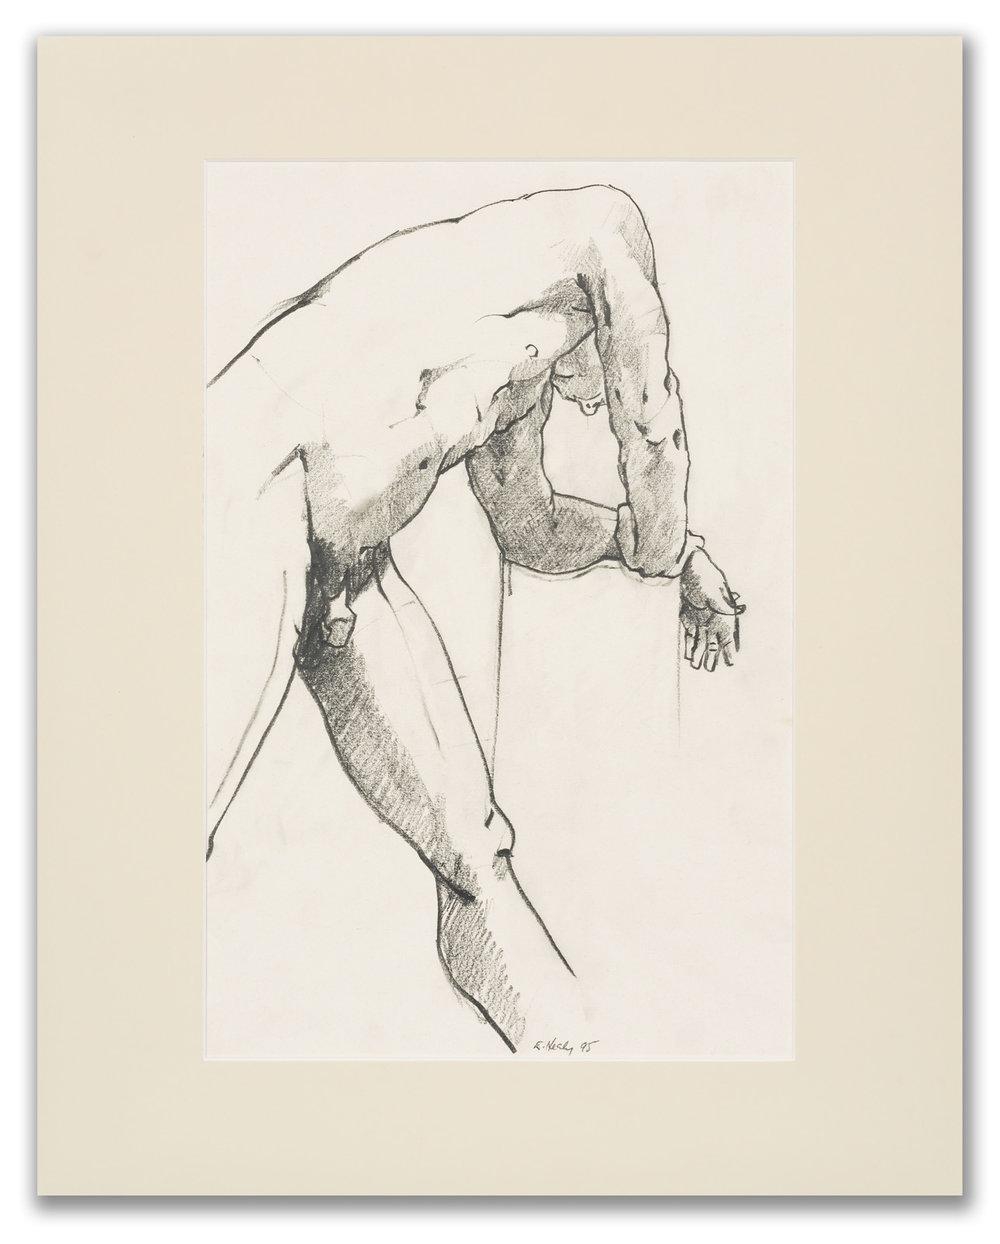 Eileen Healy, (Irish), Male Nude, 1995.